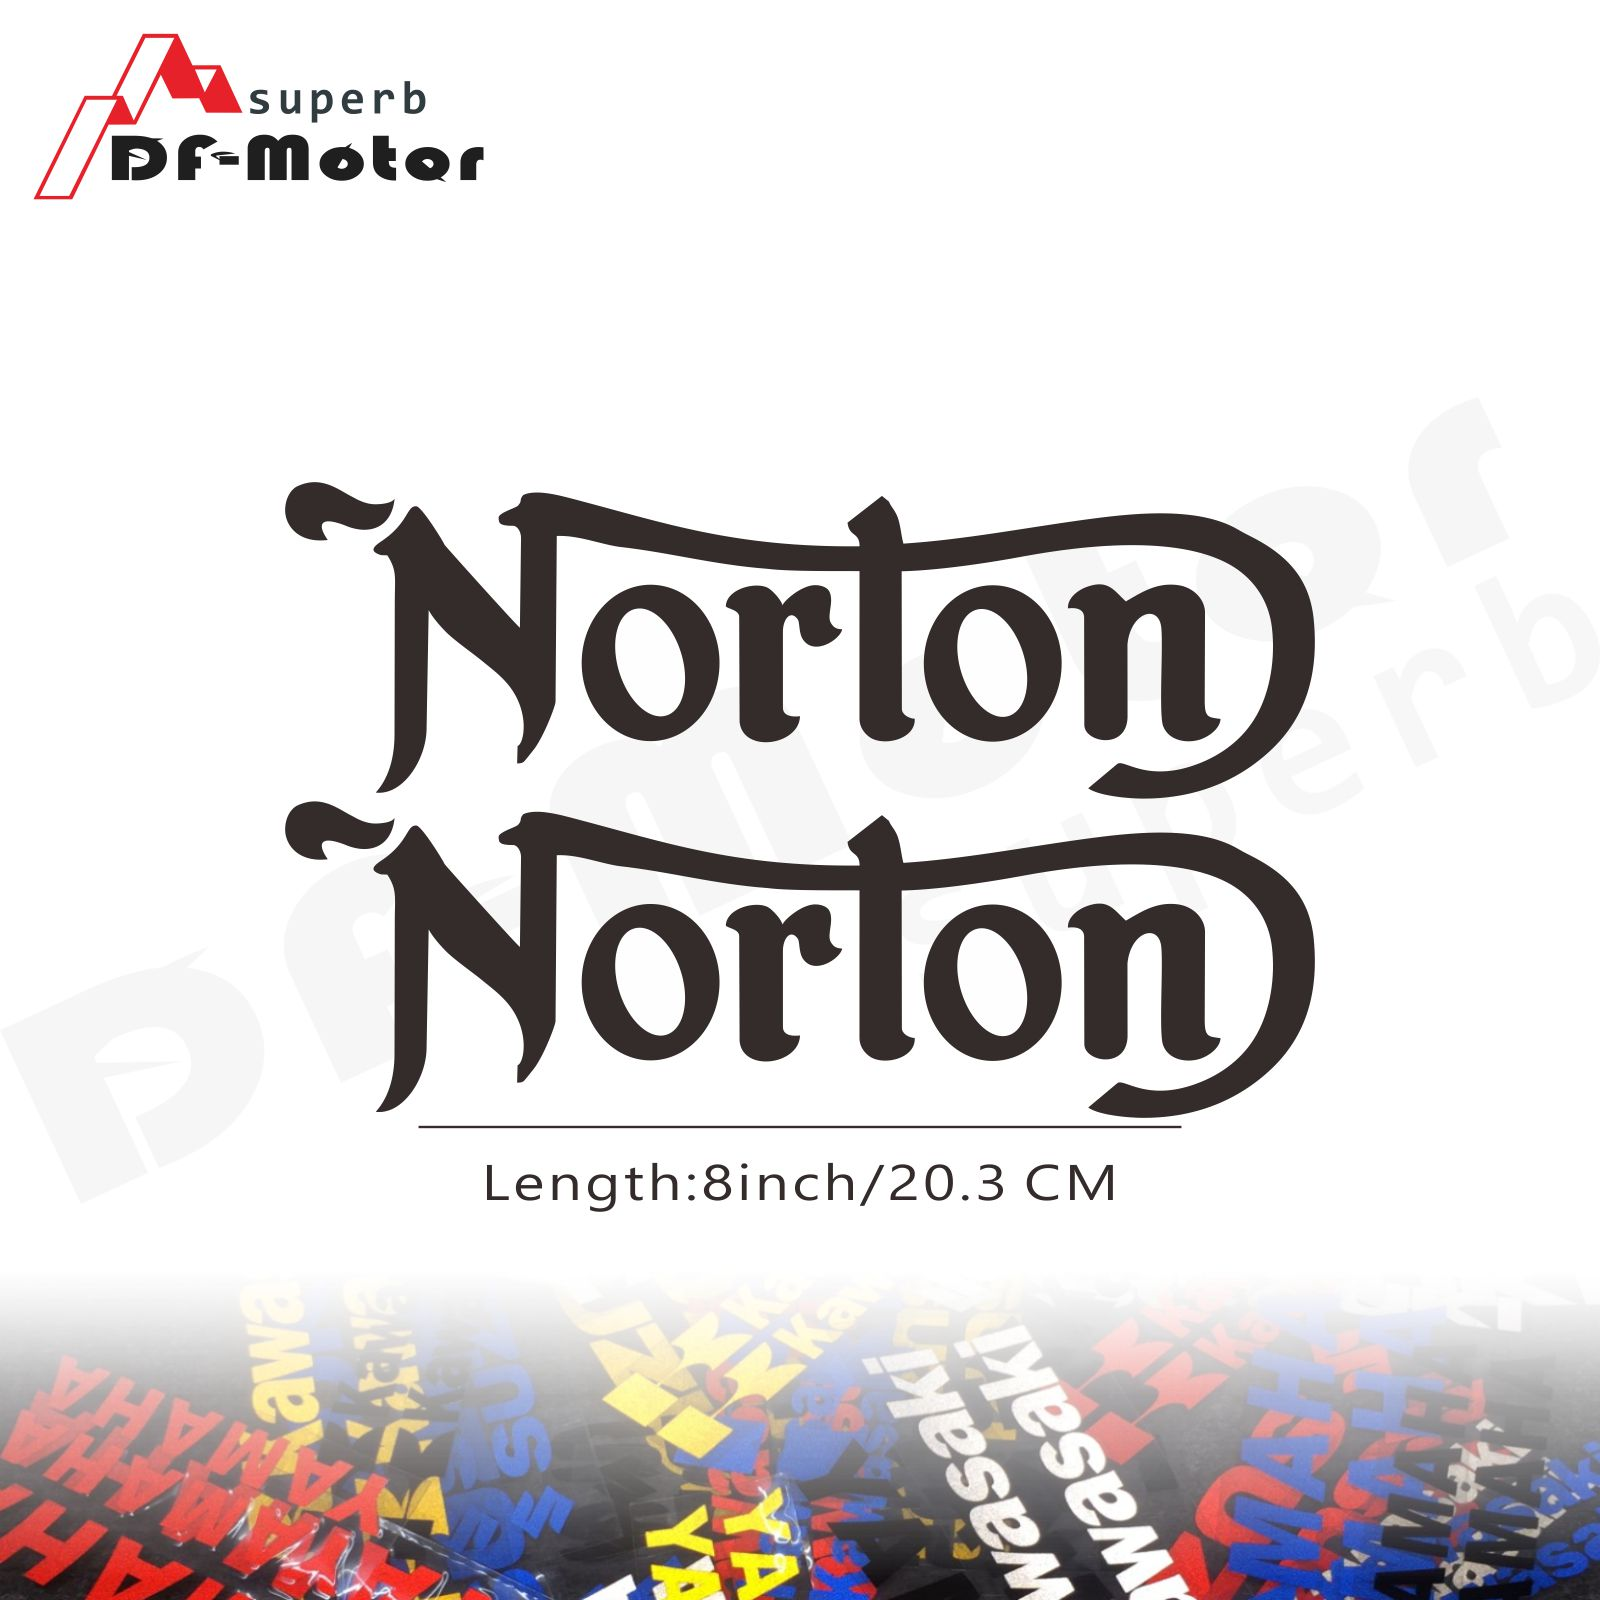 8Inch Reflective Sticker Decal Motorcycle Car Sticker Wheels Fairing Helmet Sticker Decal For Norton Motorcycles Logo